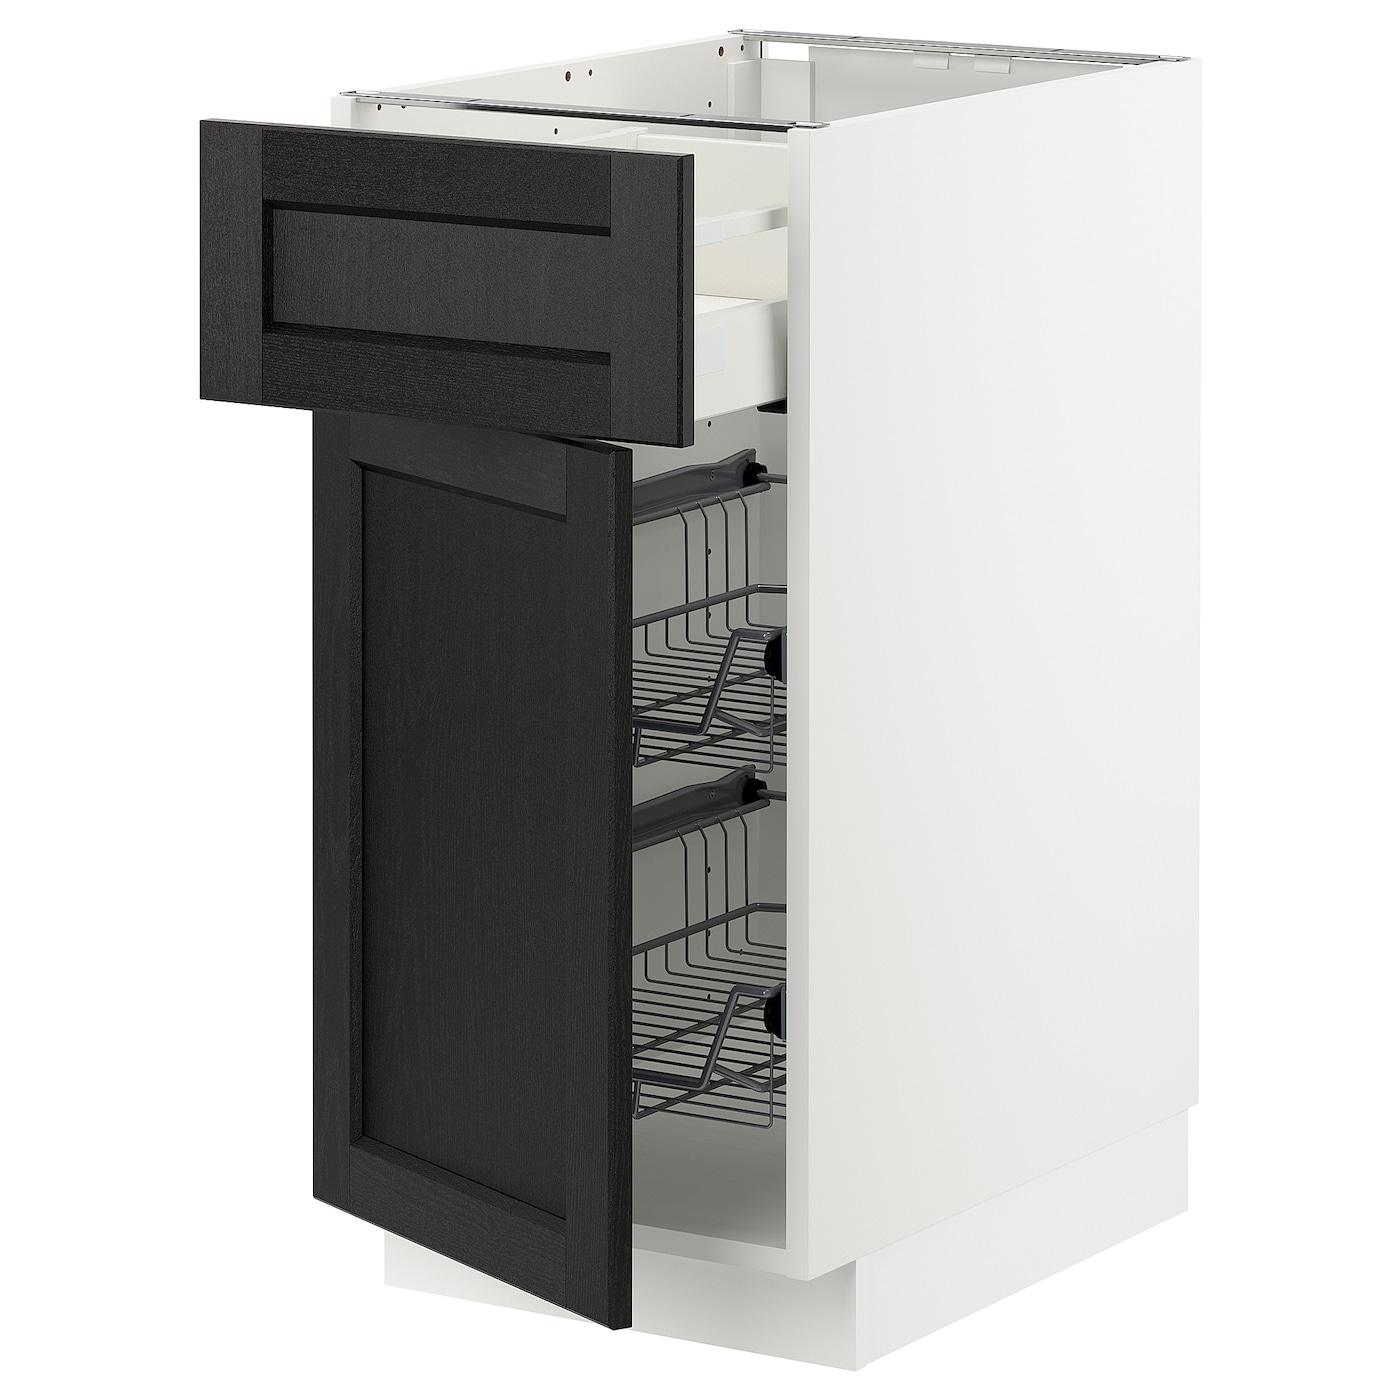 Ikea kuche drahtkorb for Ikea kuchen unterschrank